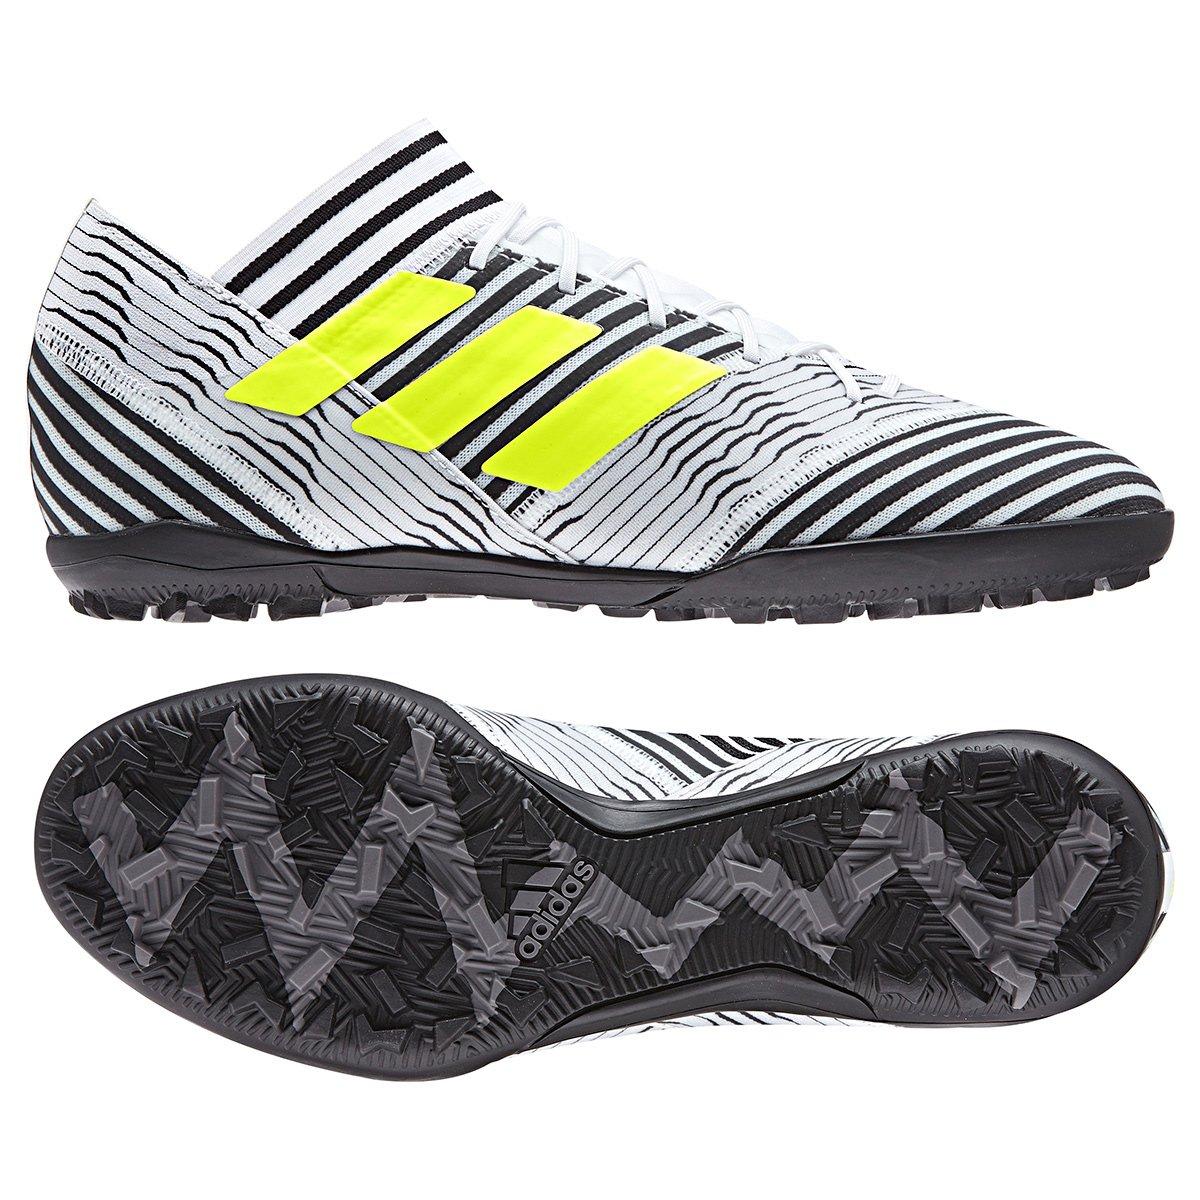 38fceaf4cf92f Chuteira Society Adidas Nemeziz 17.3 TF - Compre Agora